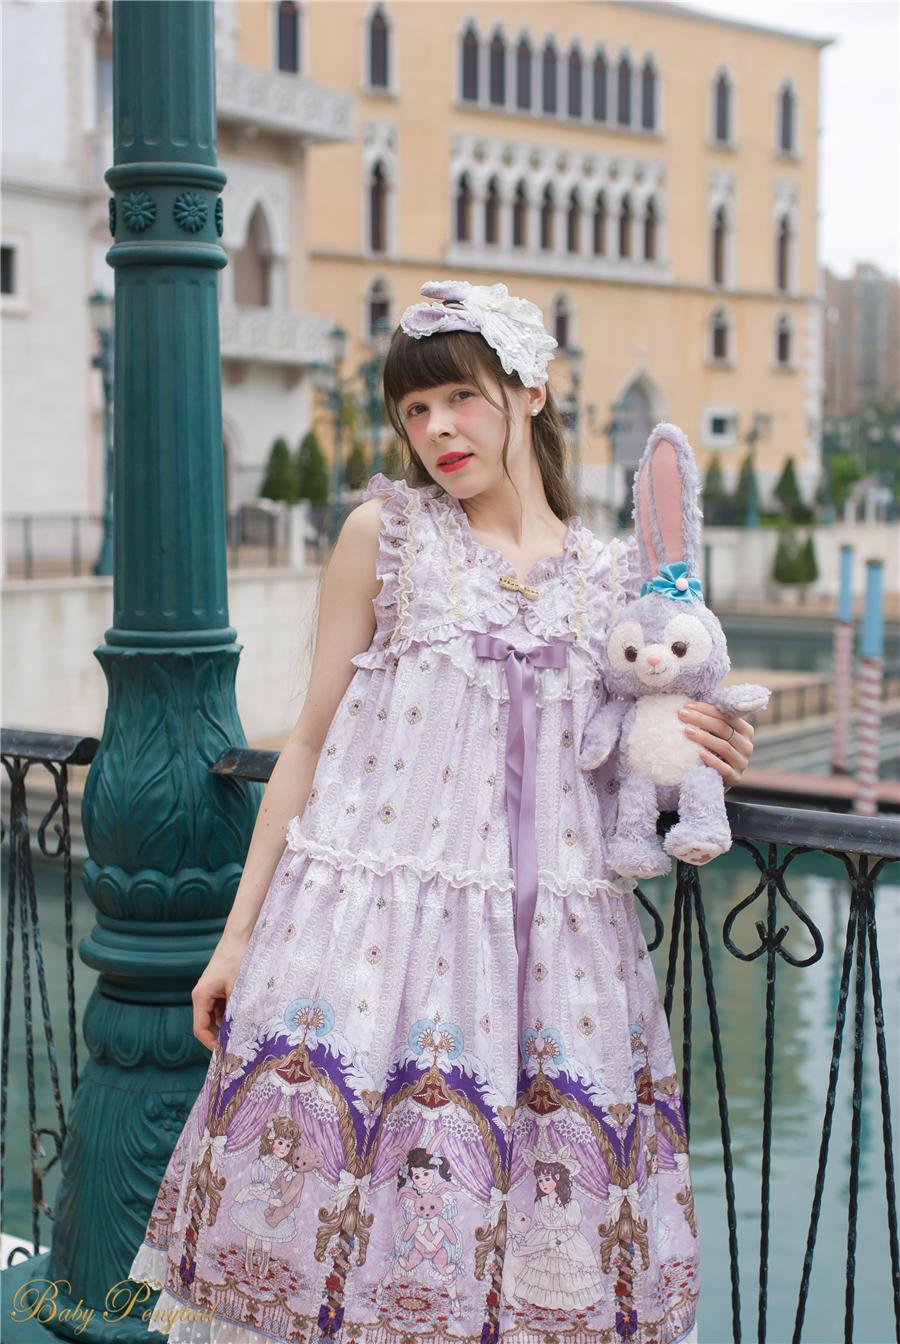 BabyPonytail_Model Preview_My Favorite Companion_Purple JSK_NG-1_Claudia_04.jpg